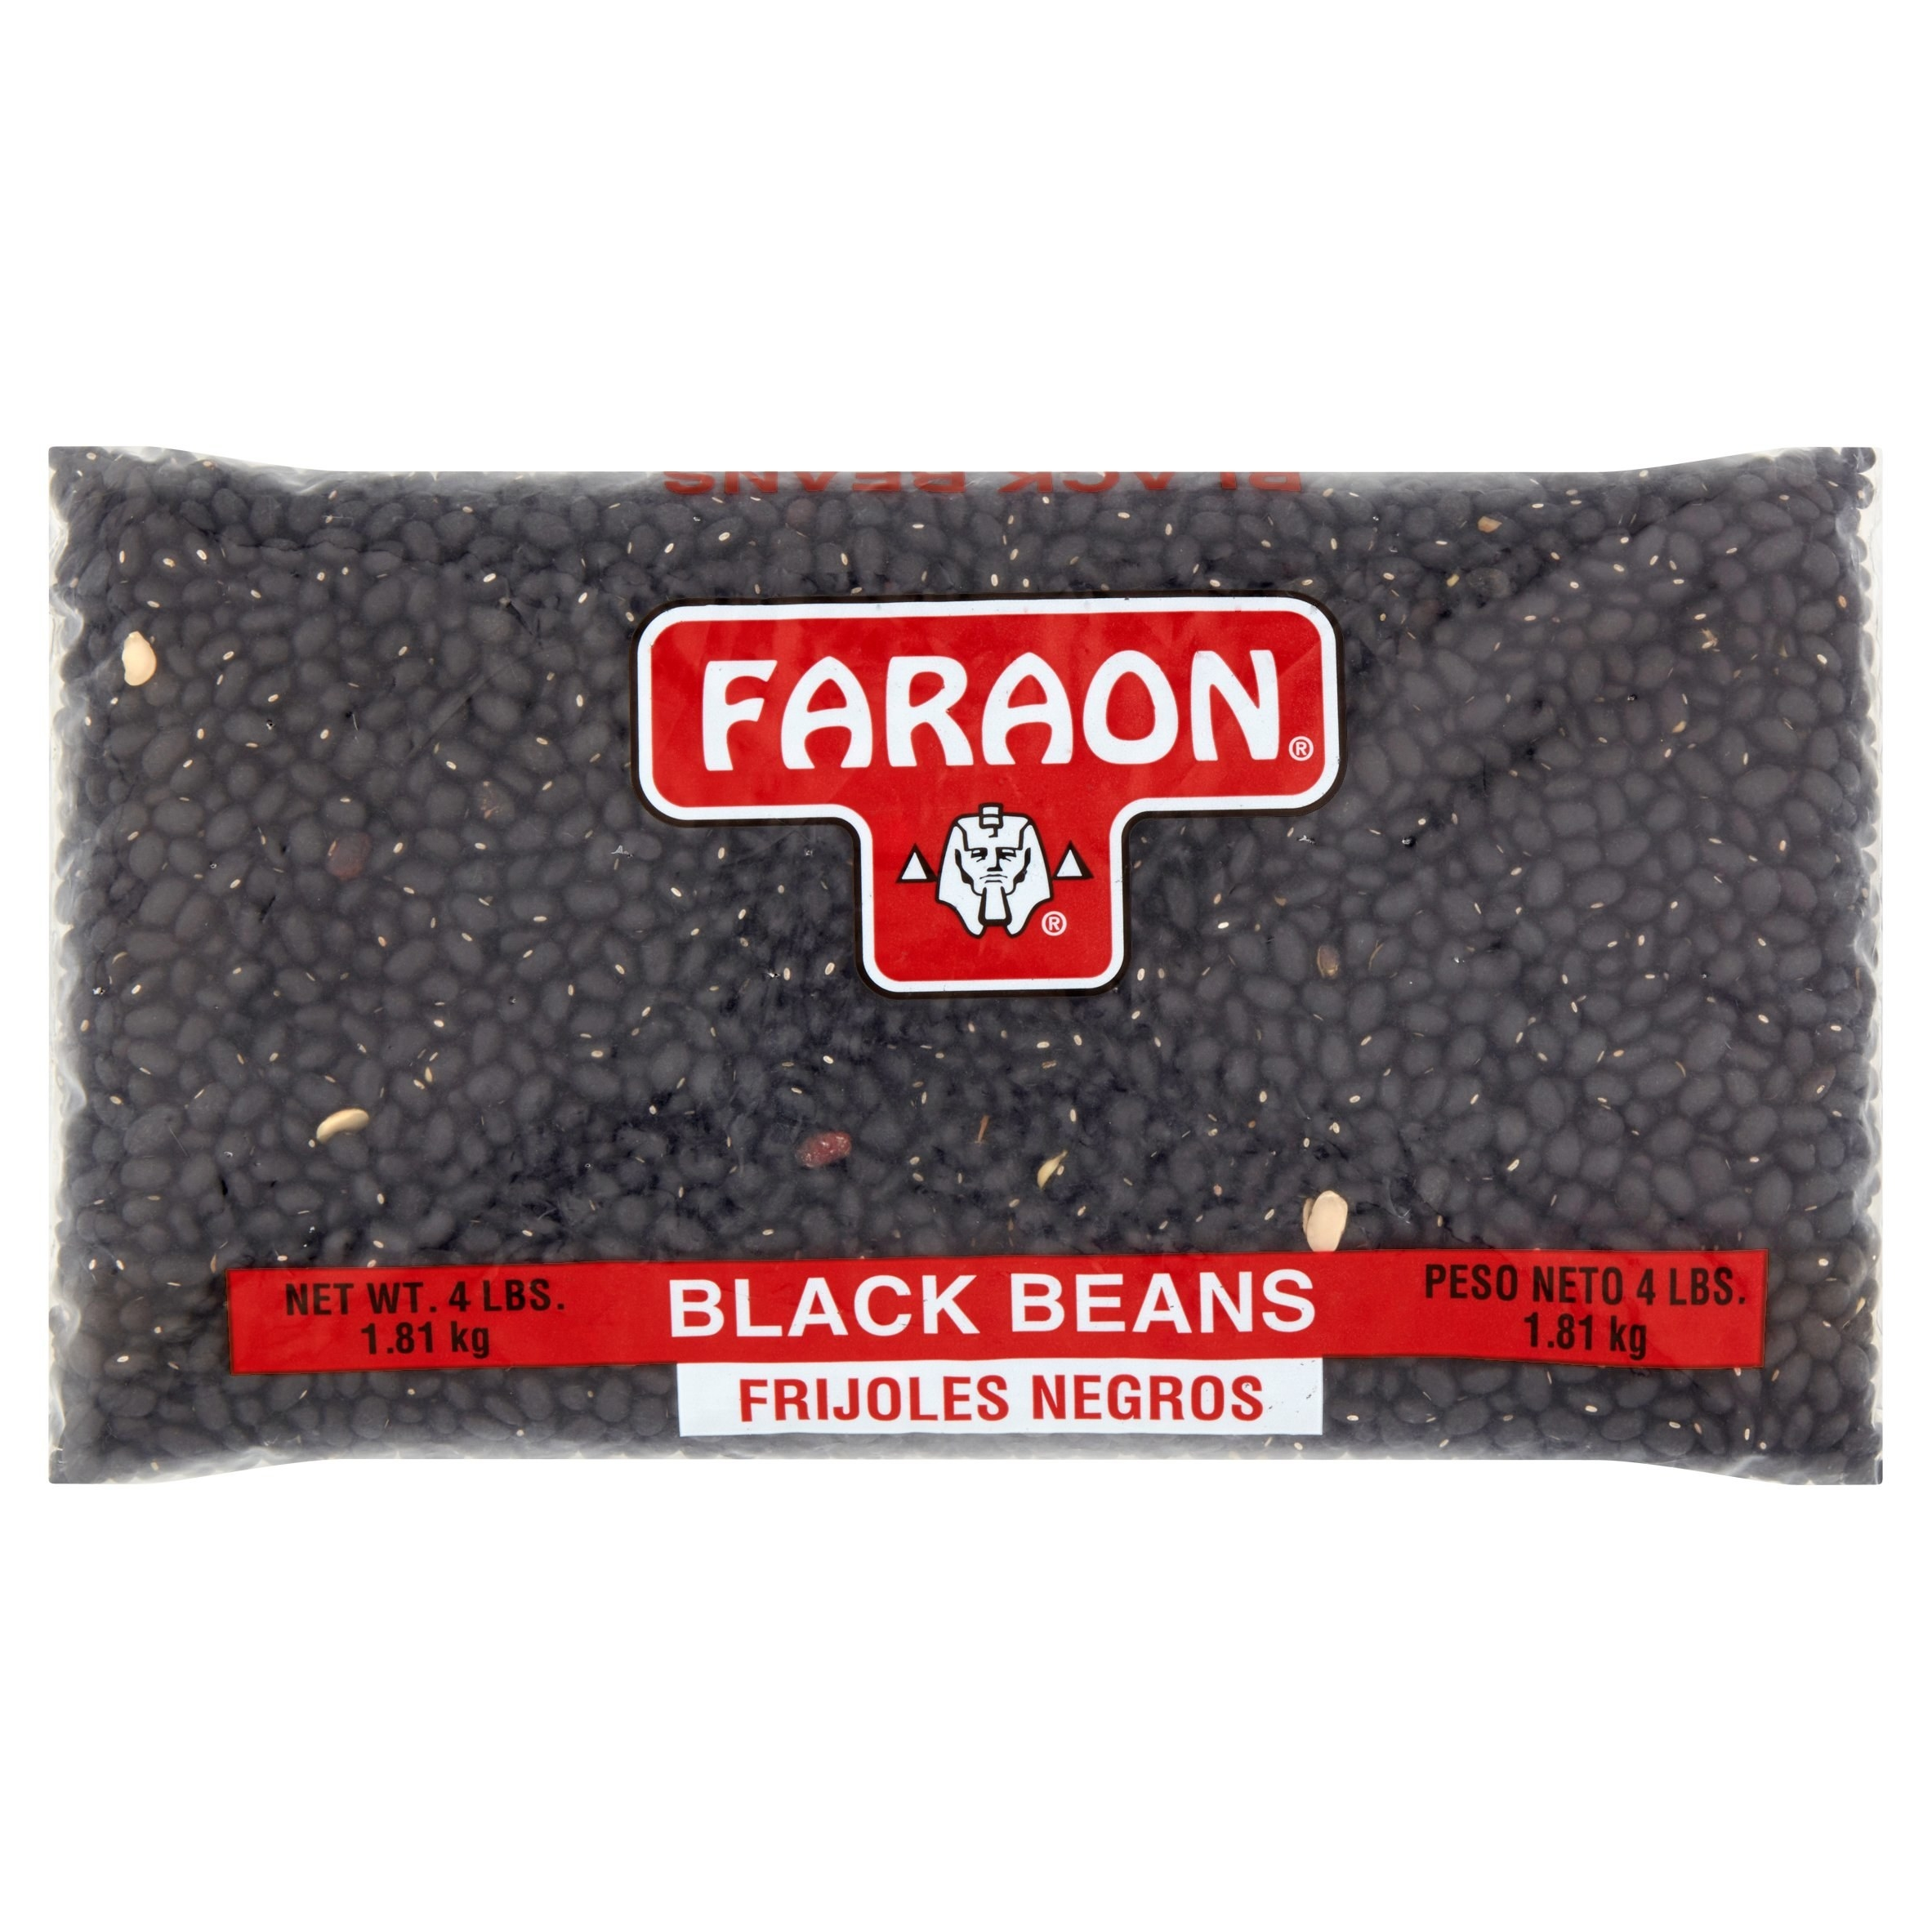 the bag of black beans